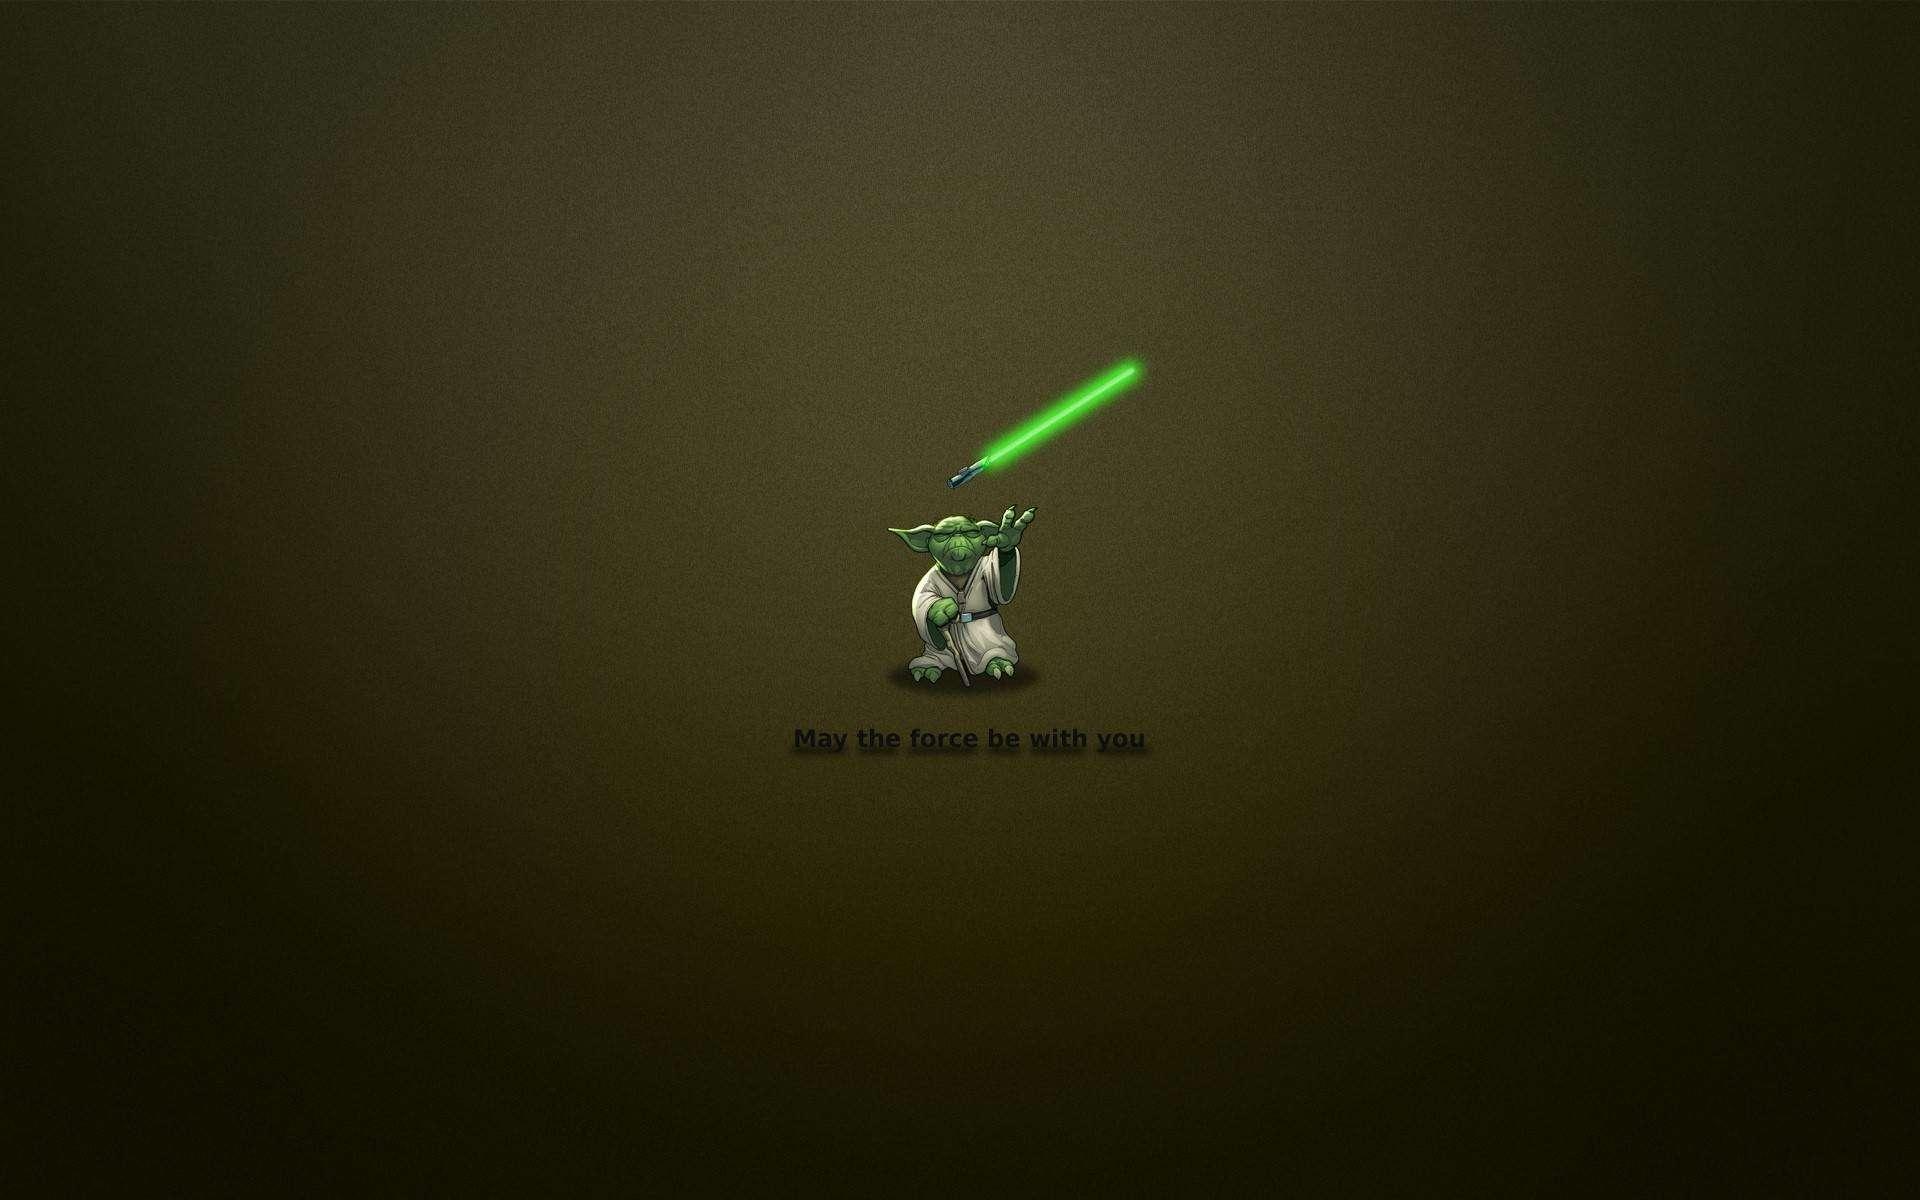 Star Wars Wallpaper 205